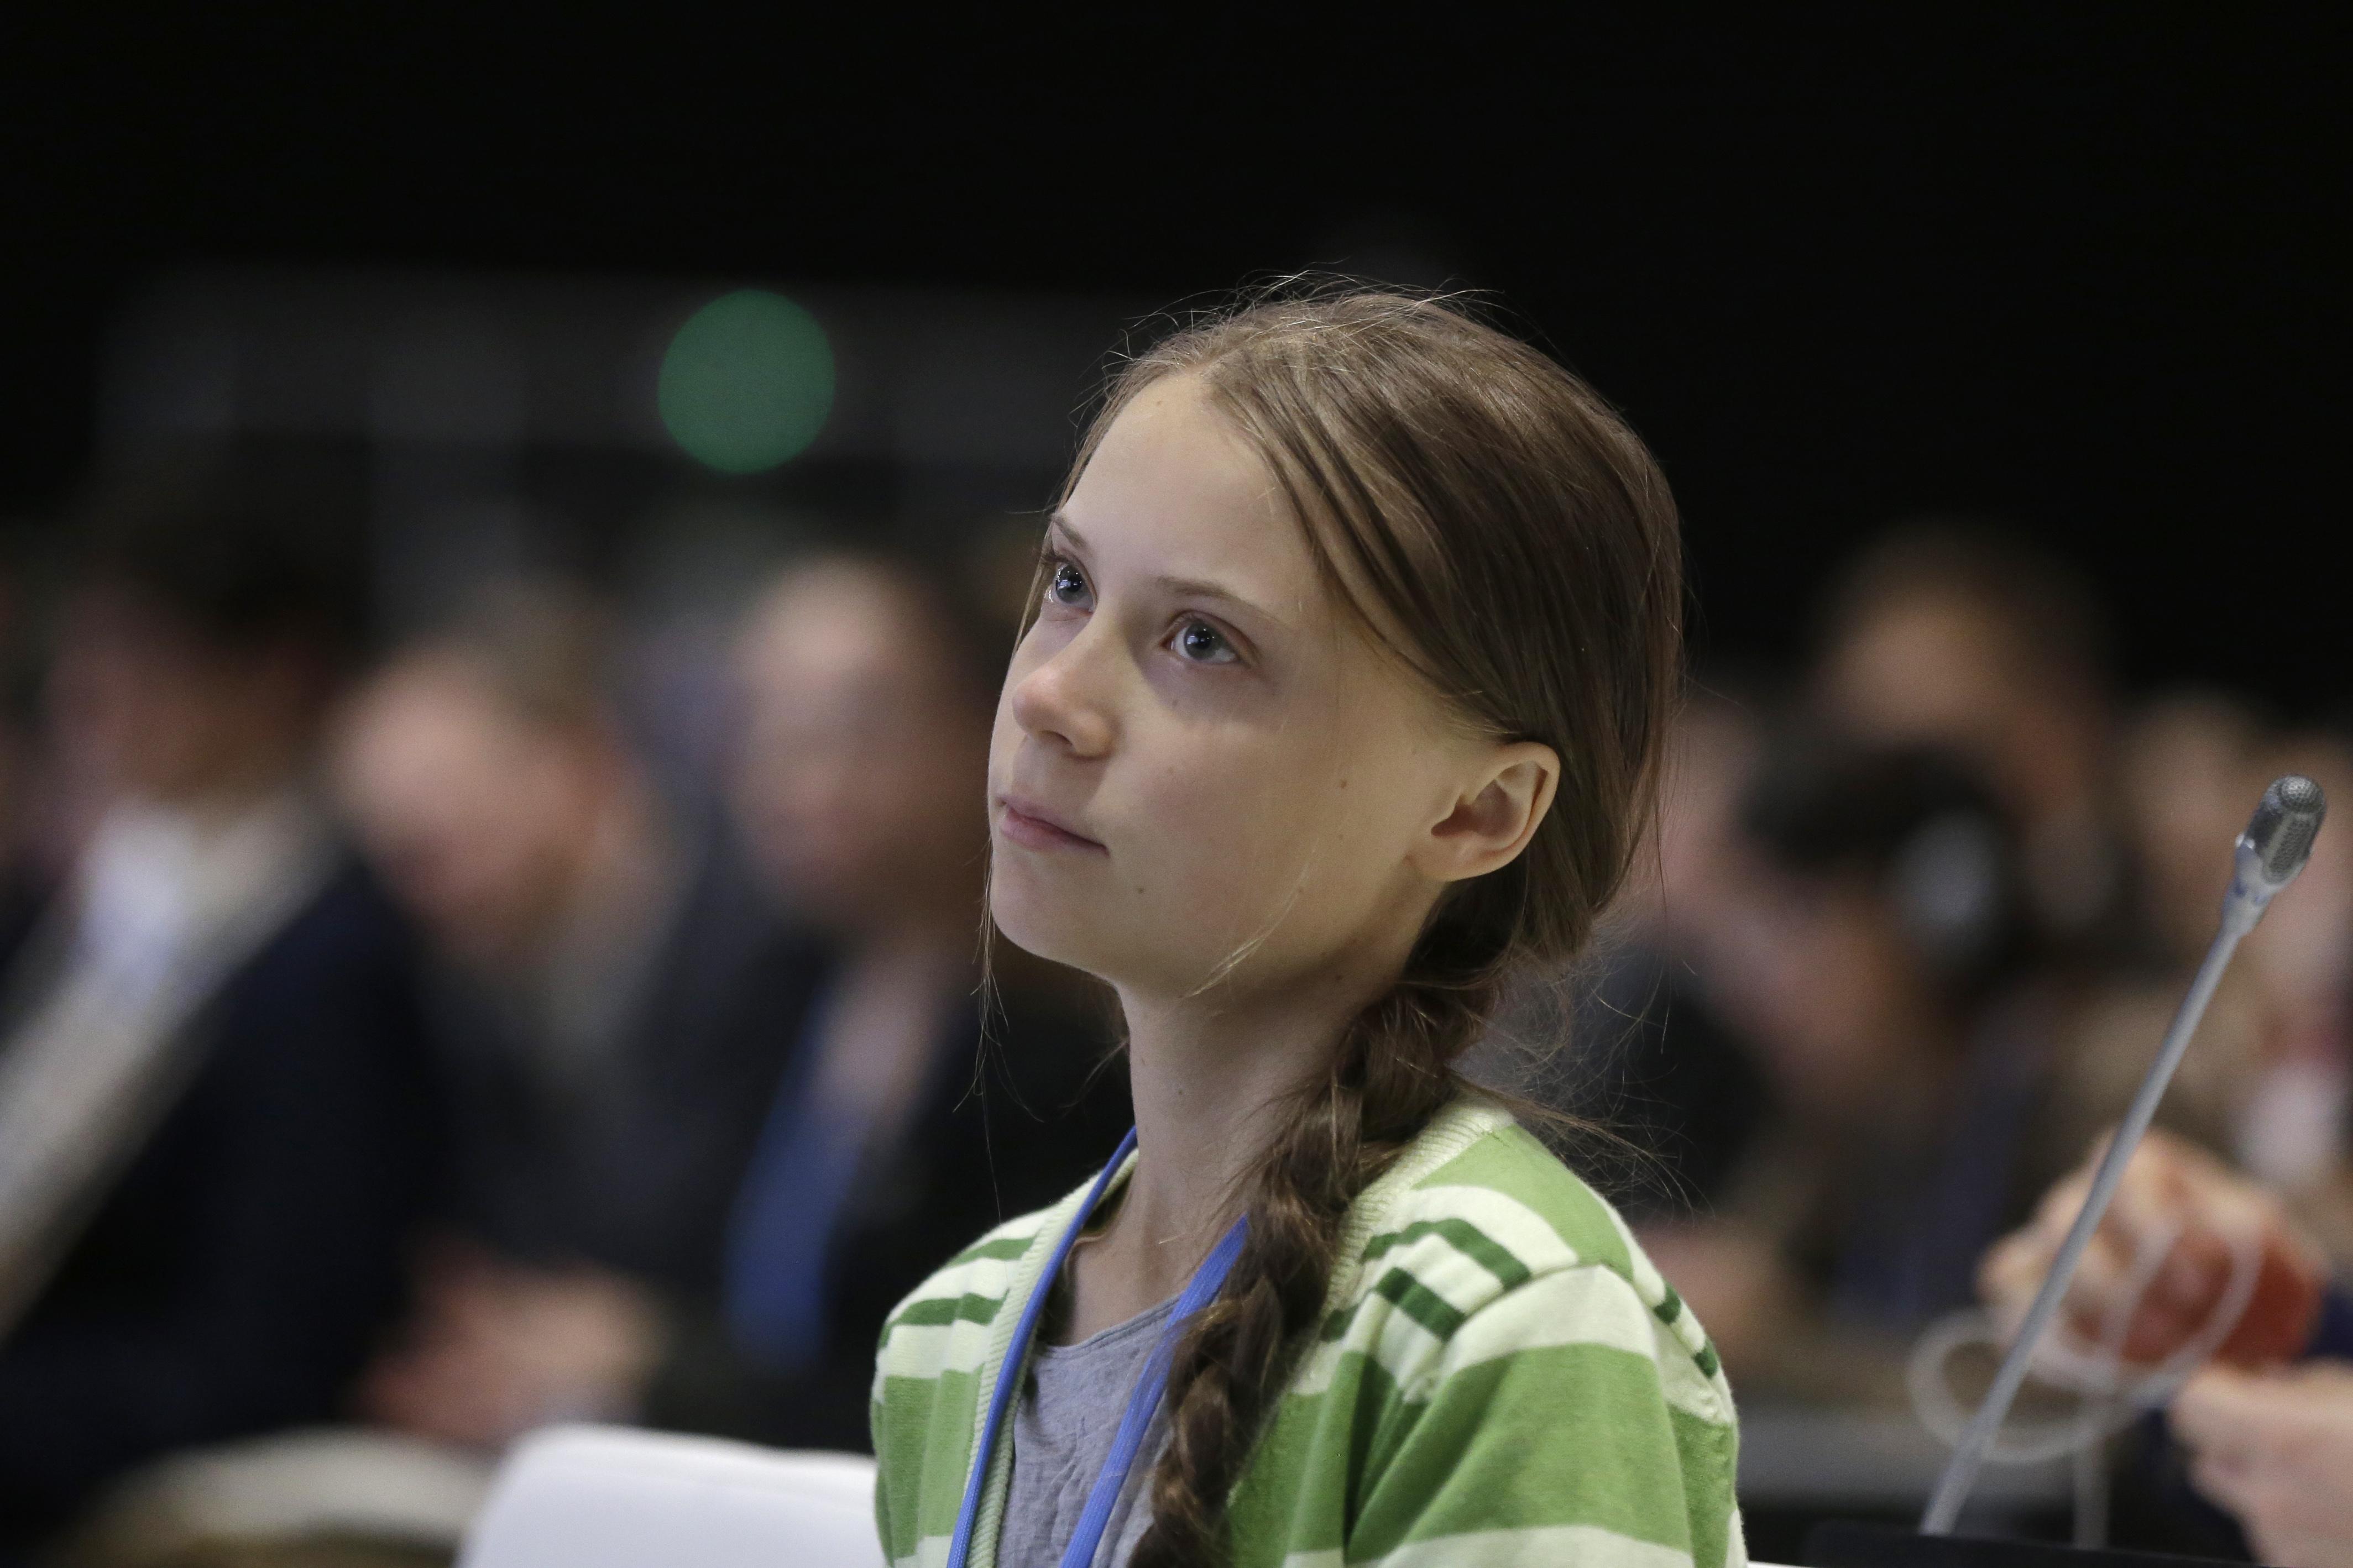 Activist Greta Thunberg sits on floor on homeward-bound German train